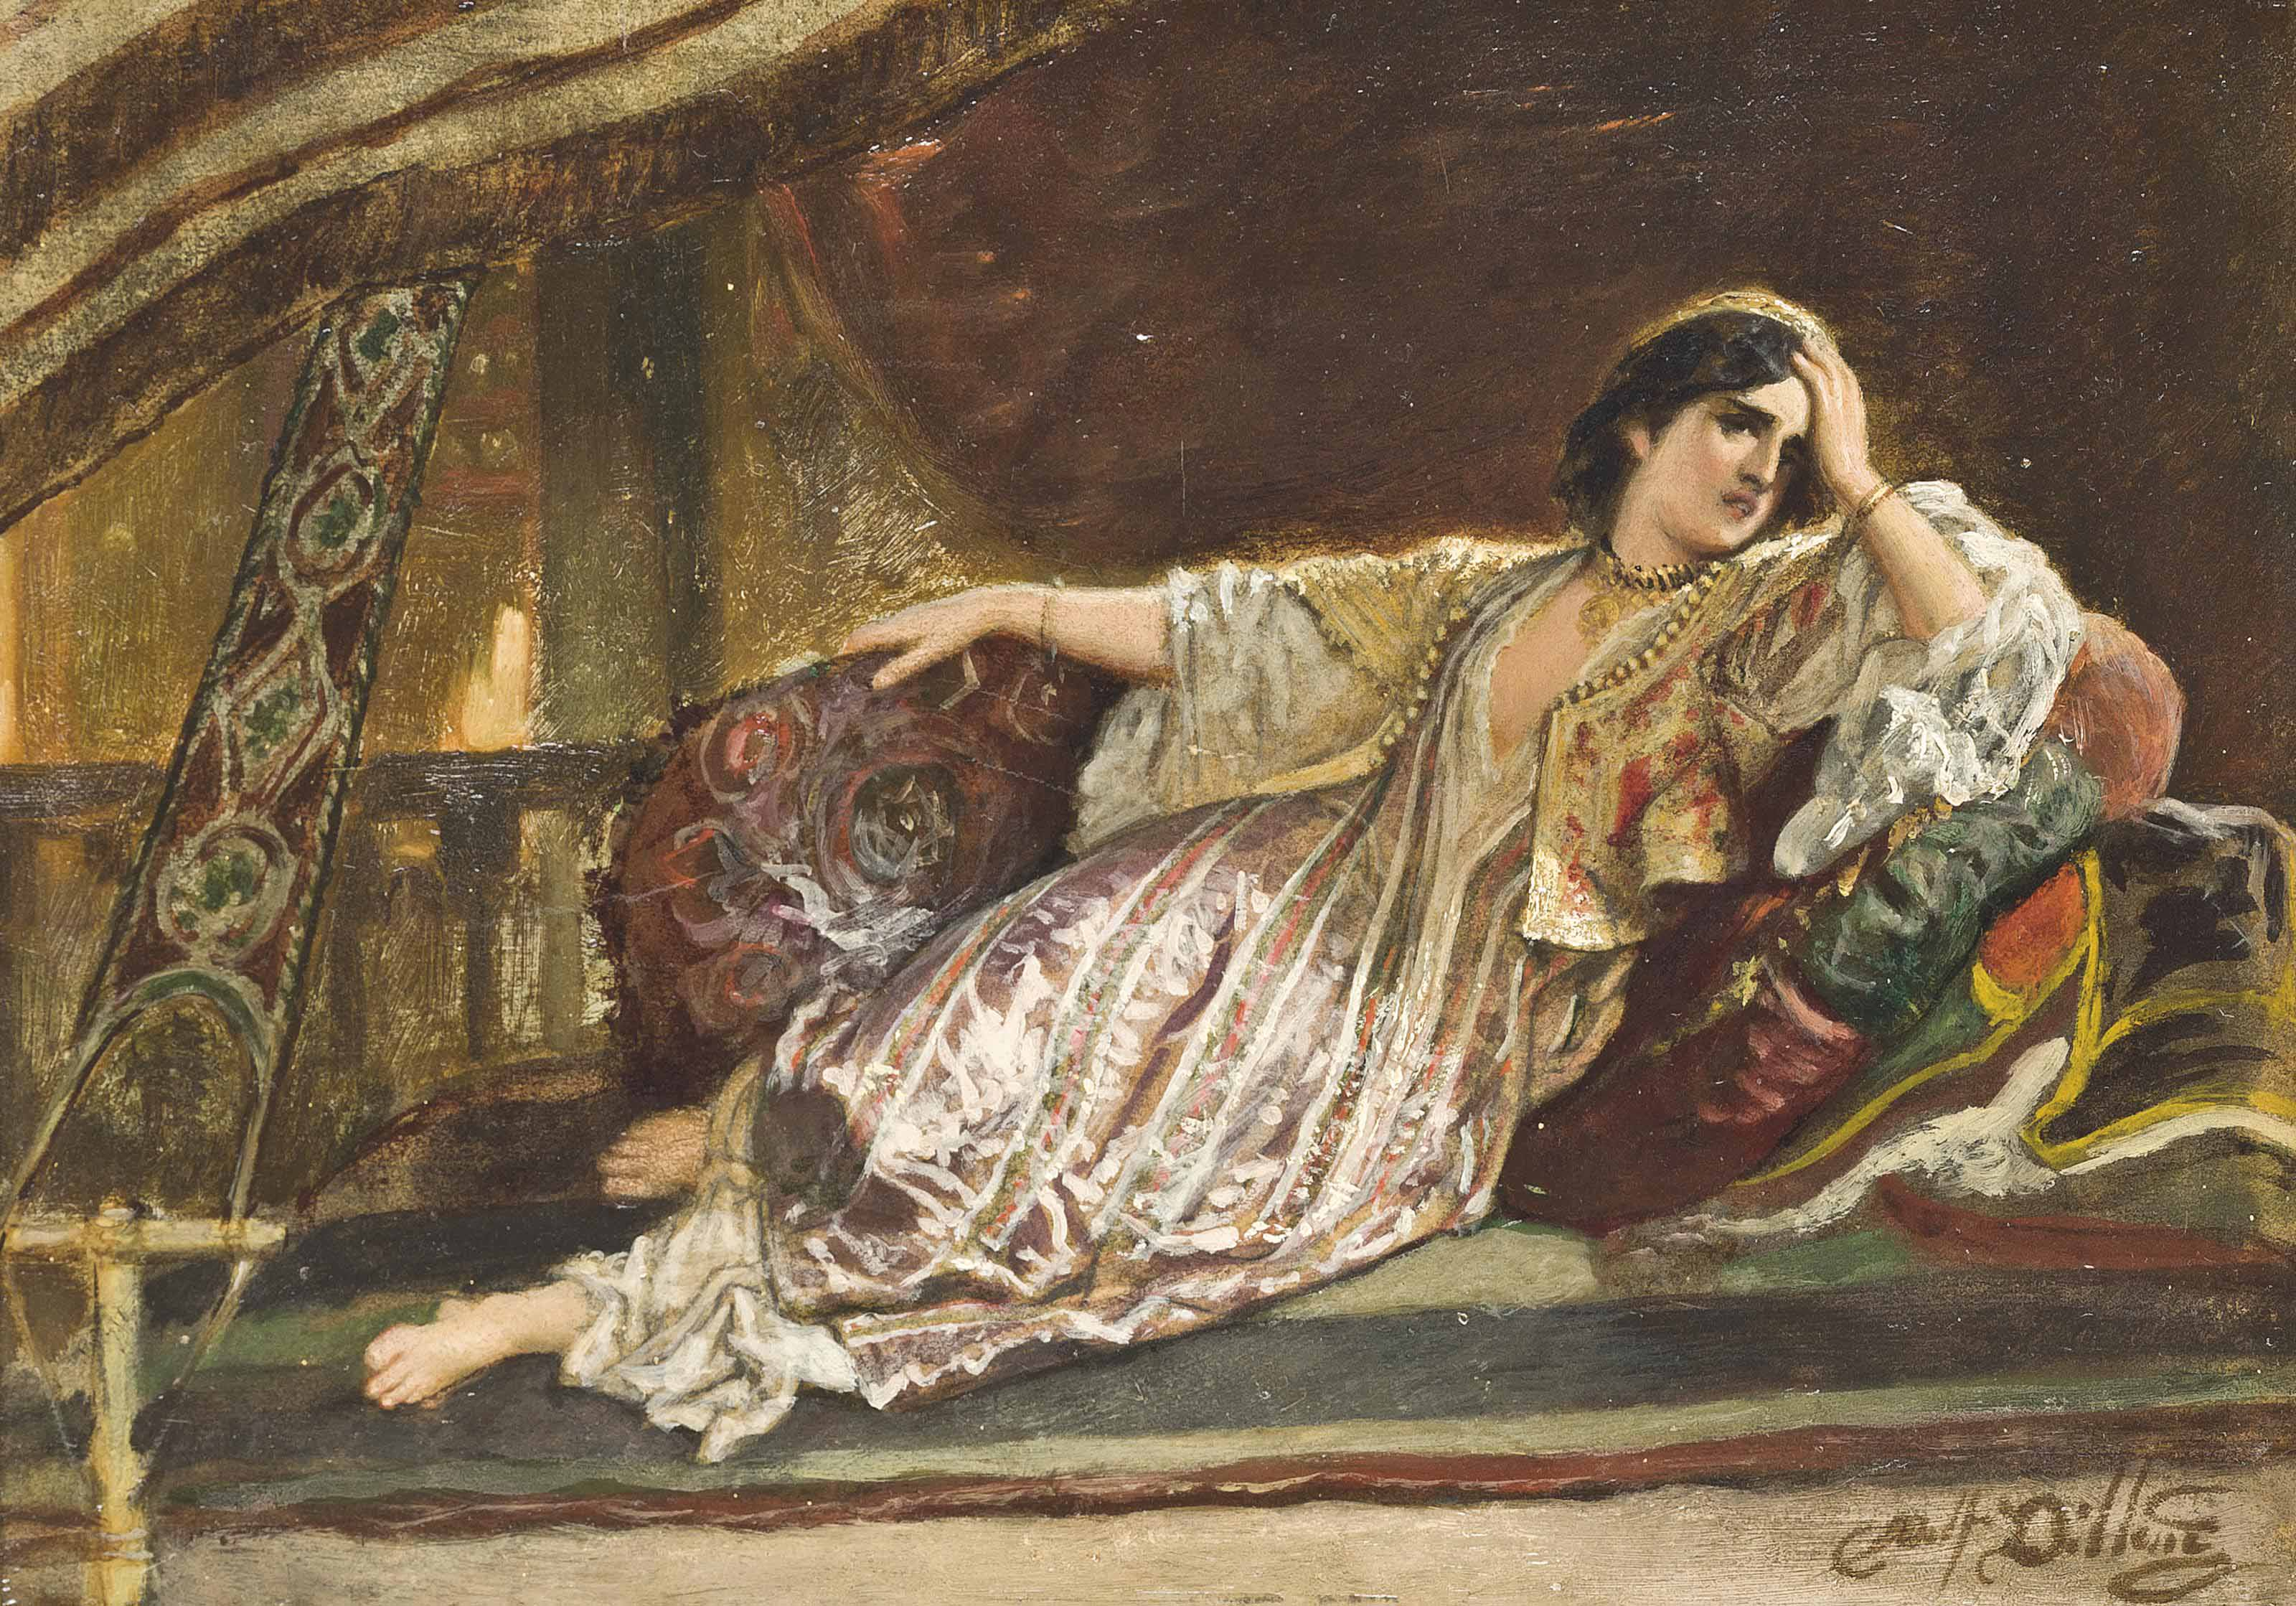 Madame Adolf Dillens, née Thérese Legros